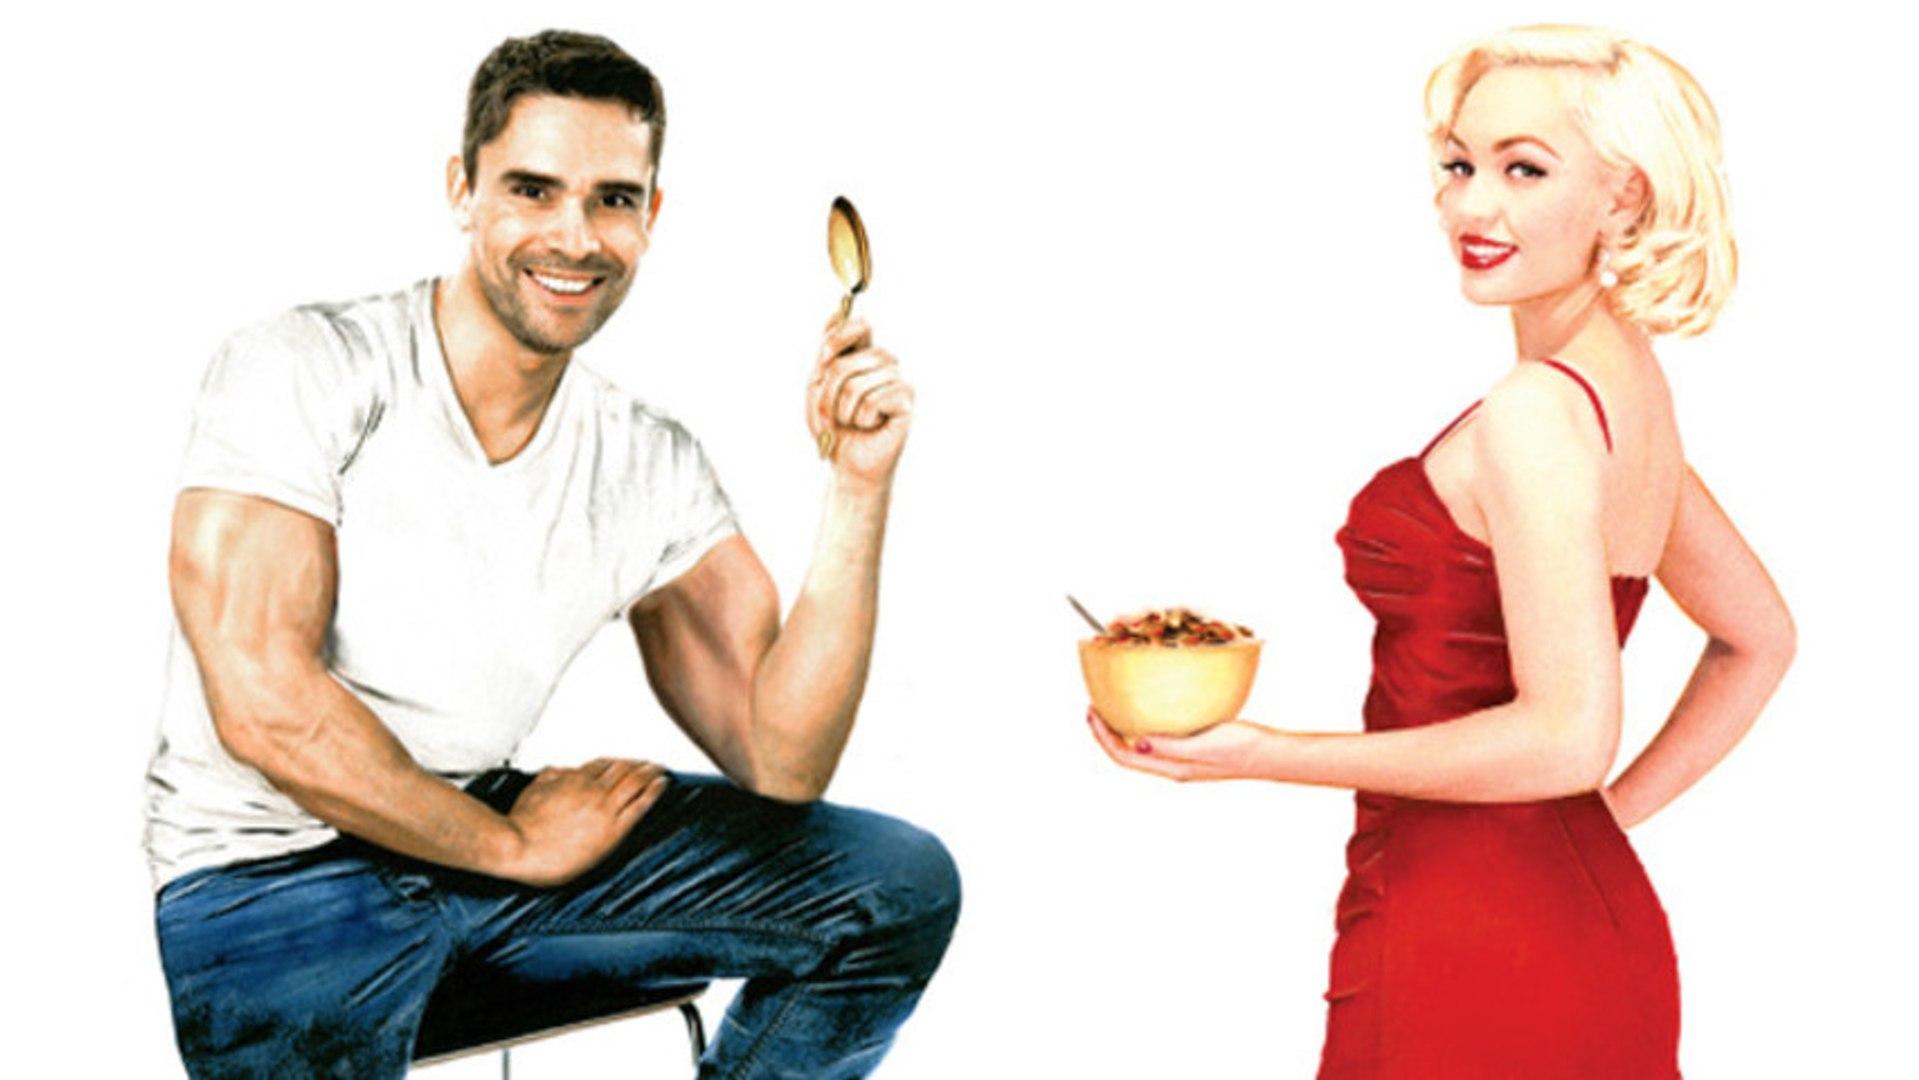 Sex Cereal For Men. Sex Cereal For Women